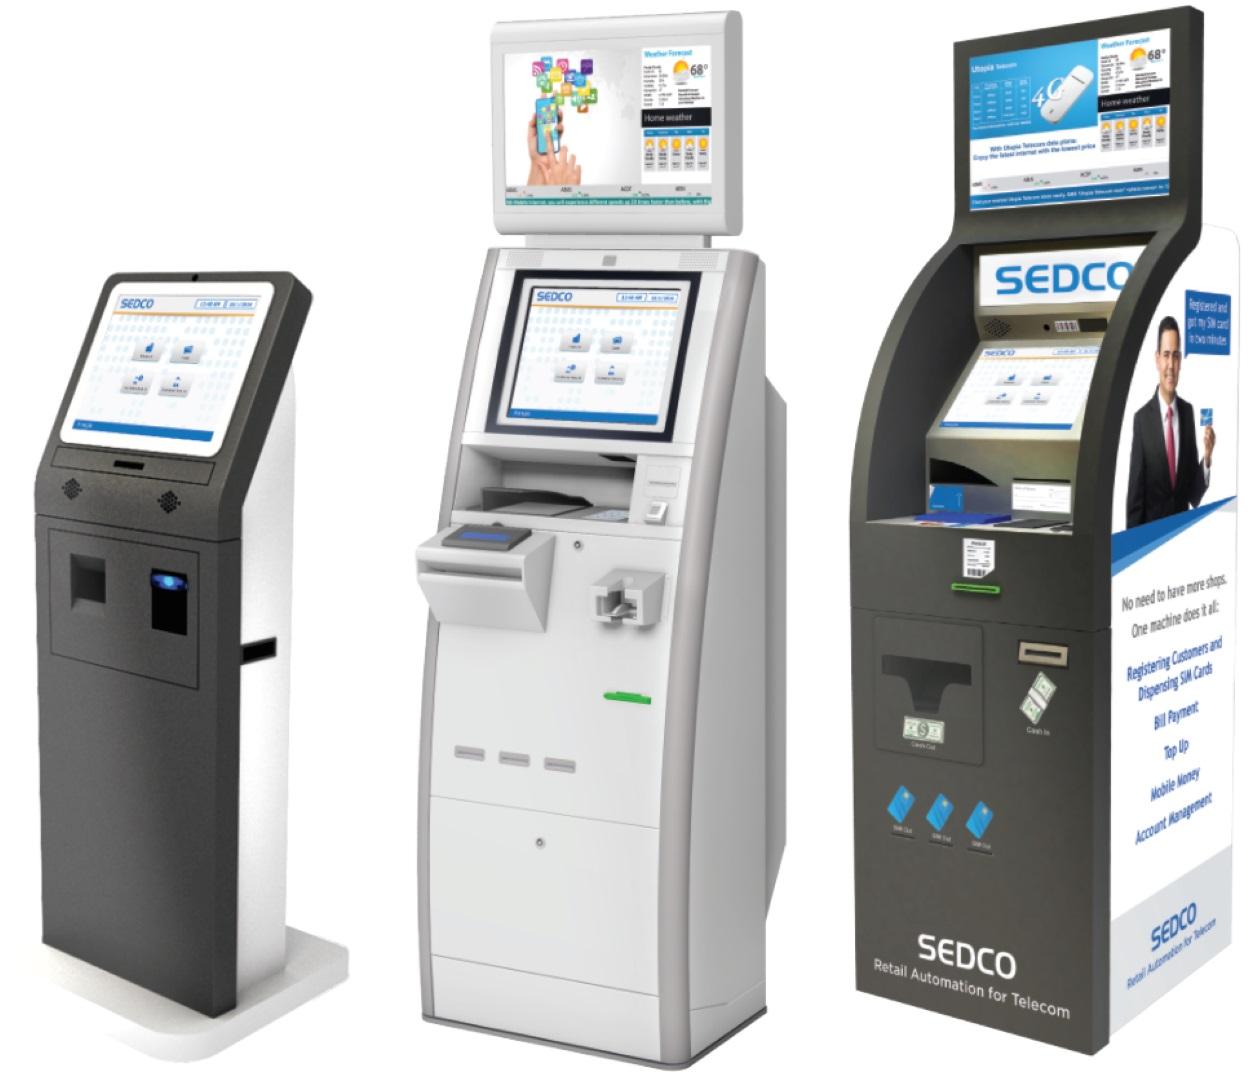 Self Service Kiosks - SEDCO